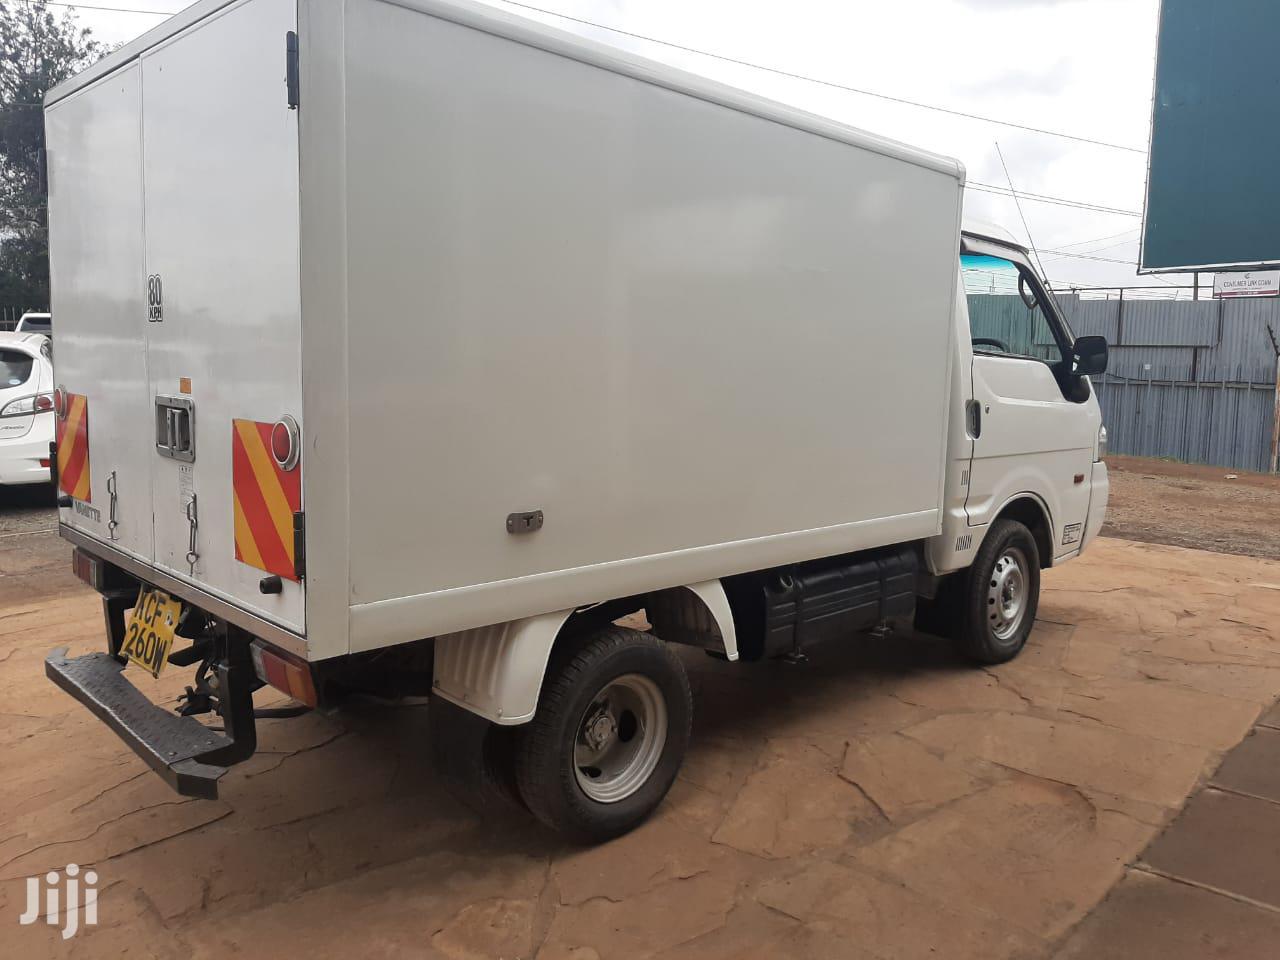 Nissan Vanette Truck   Trucks & Trailers for sale in Township E, Kiambu, Kenya